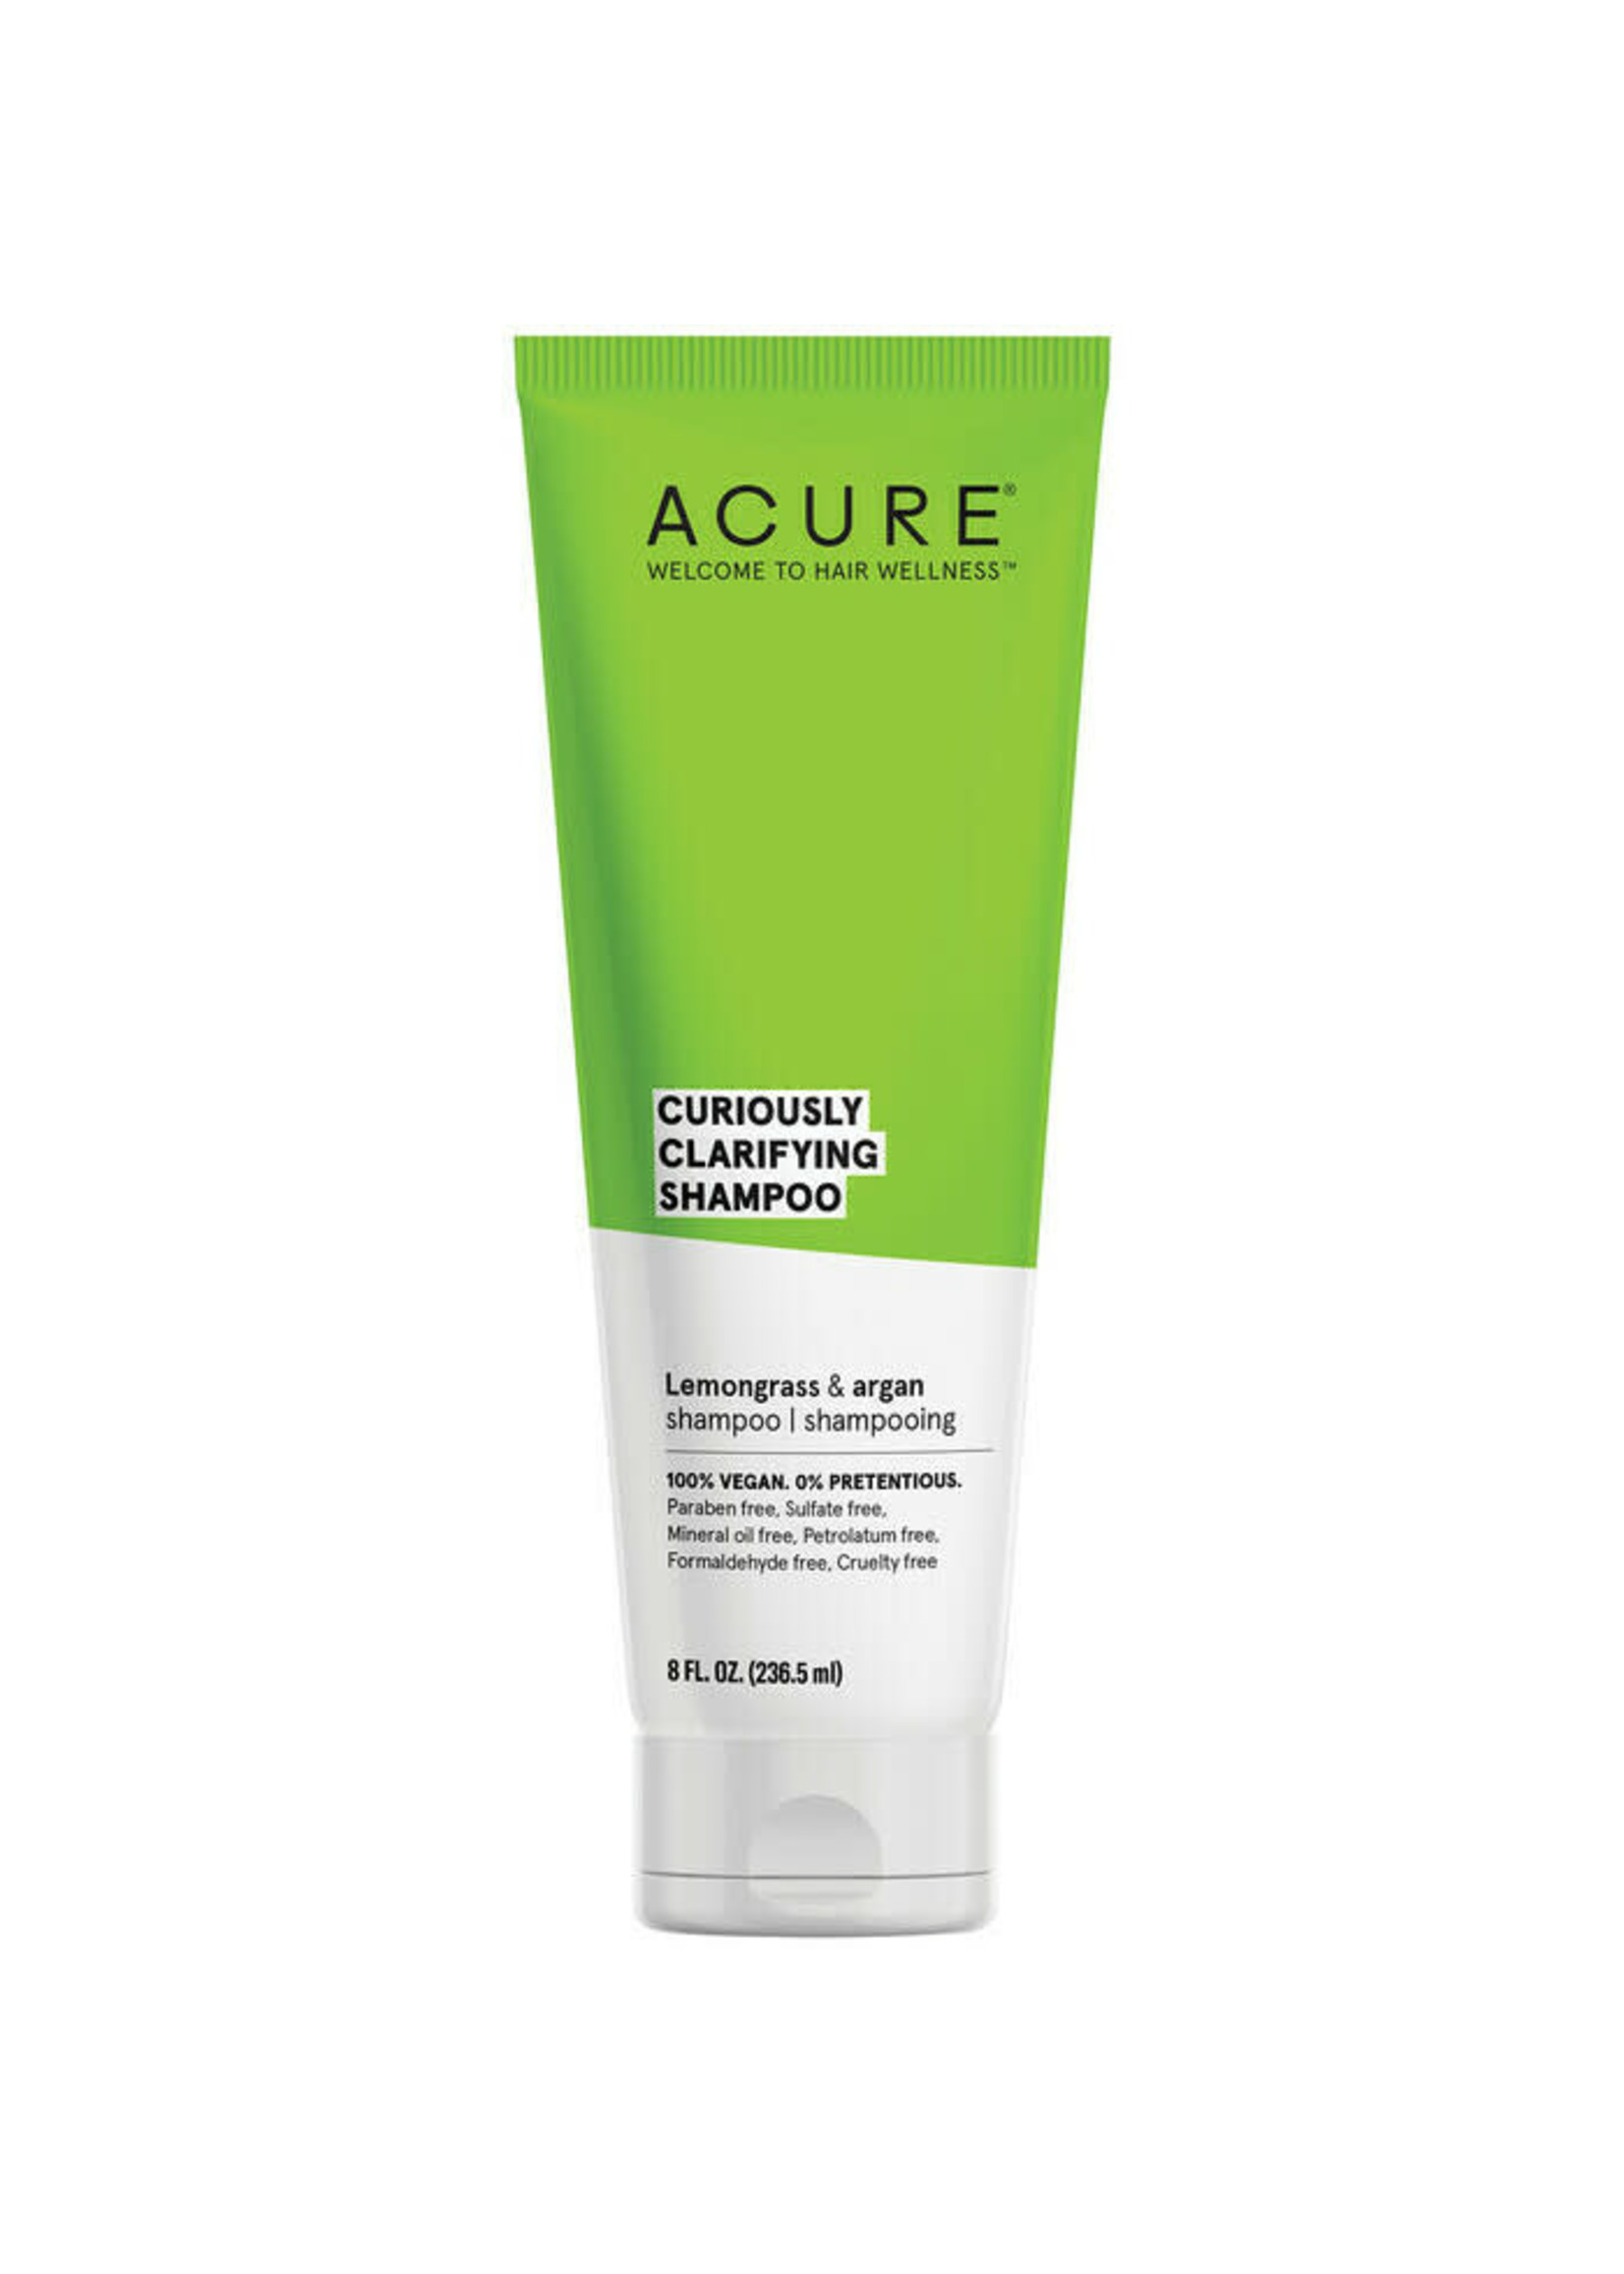 Acure Acure Curiously Clarifying Shampoo Lemongrass & Argan 236mls